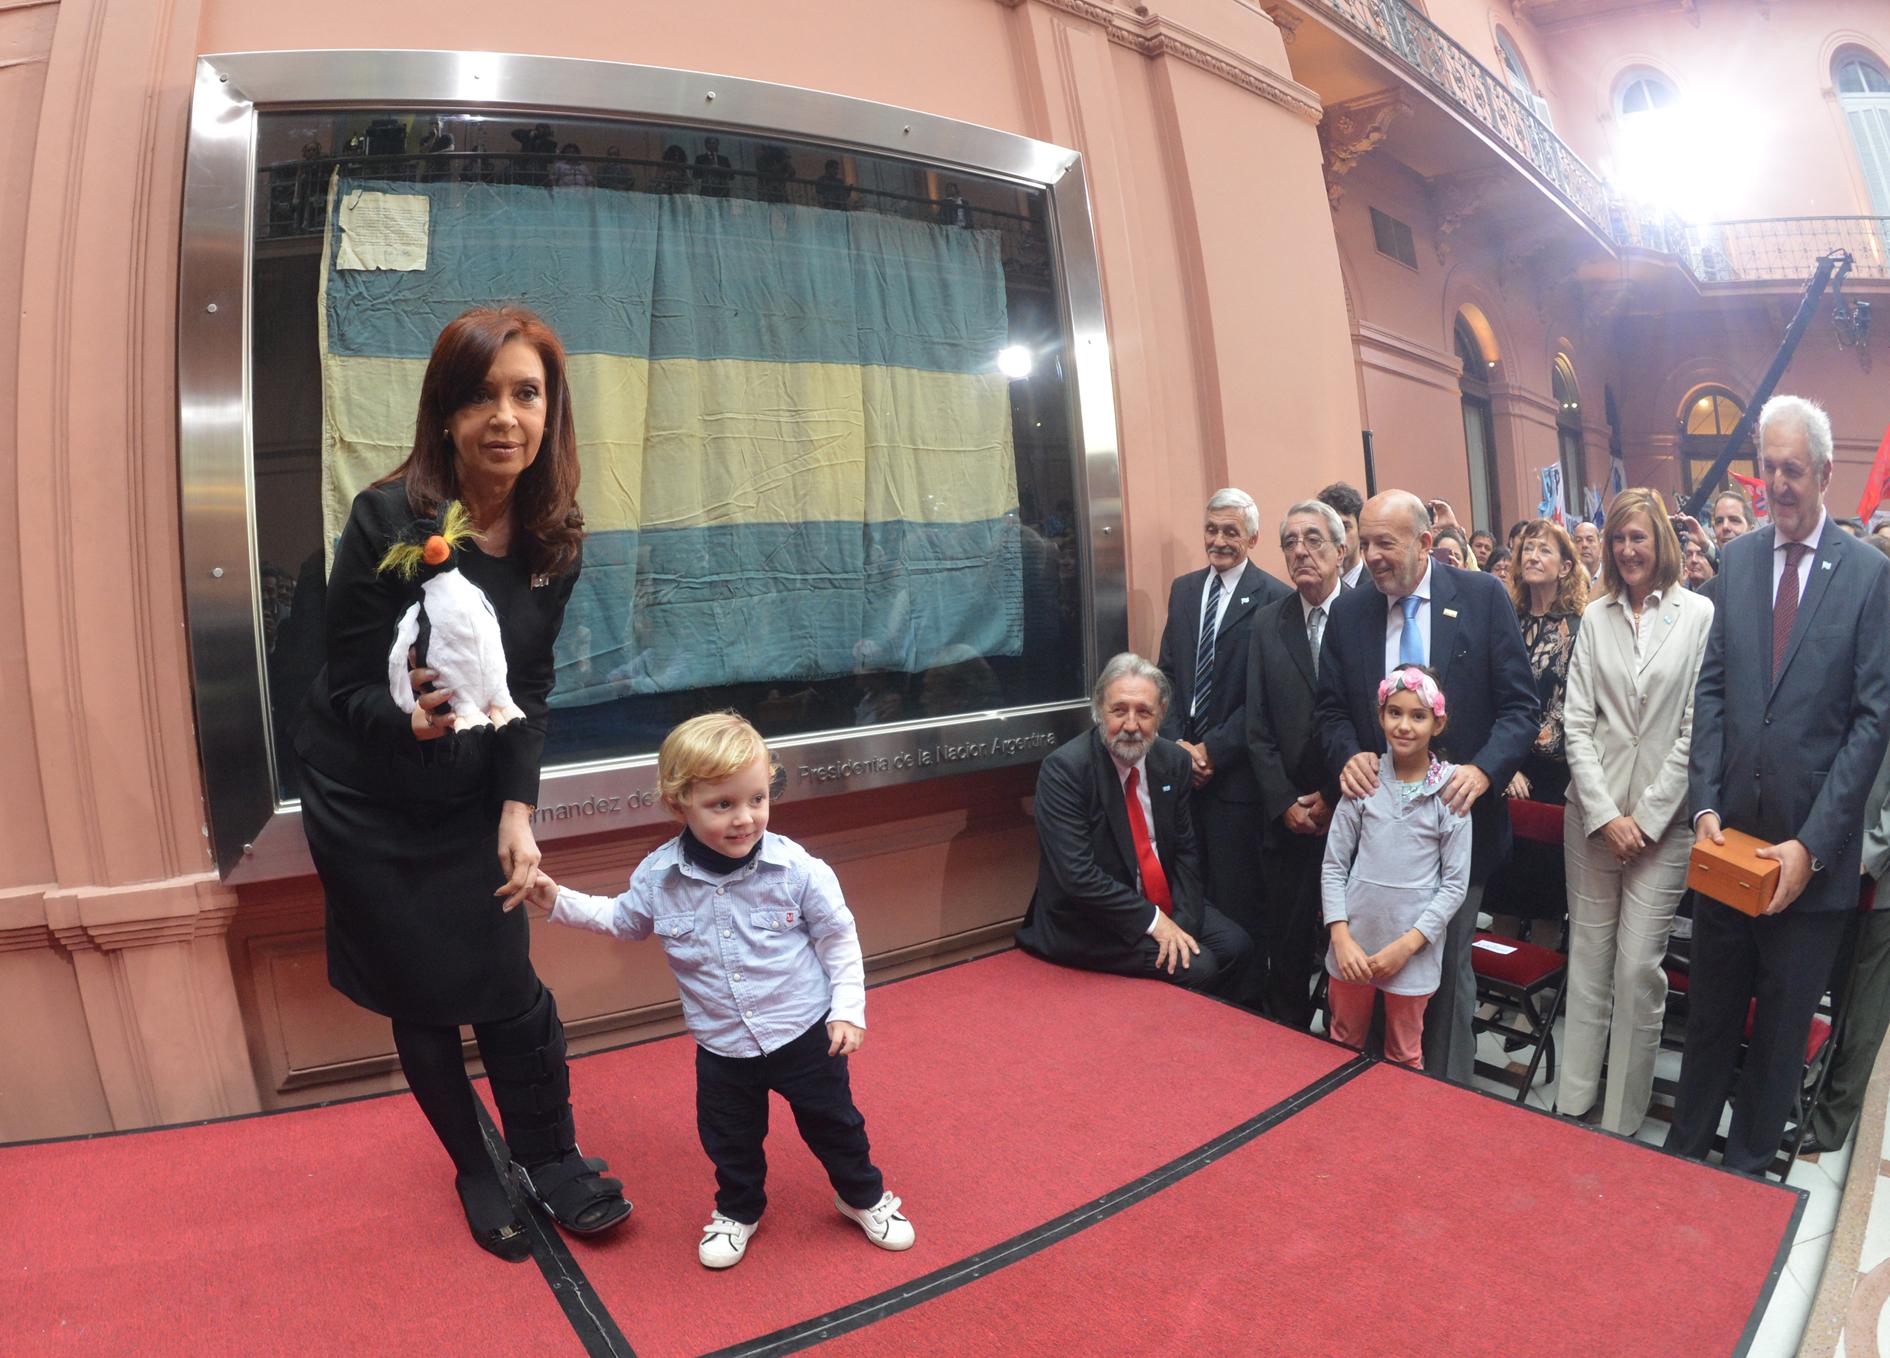 Cristina Kirchner Malvinas Argentinas